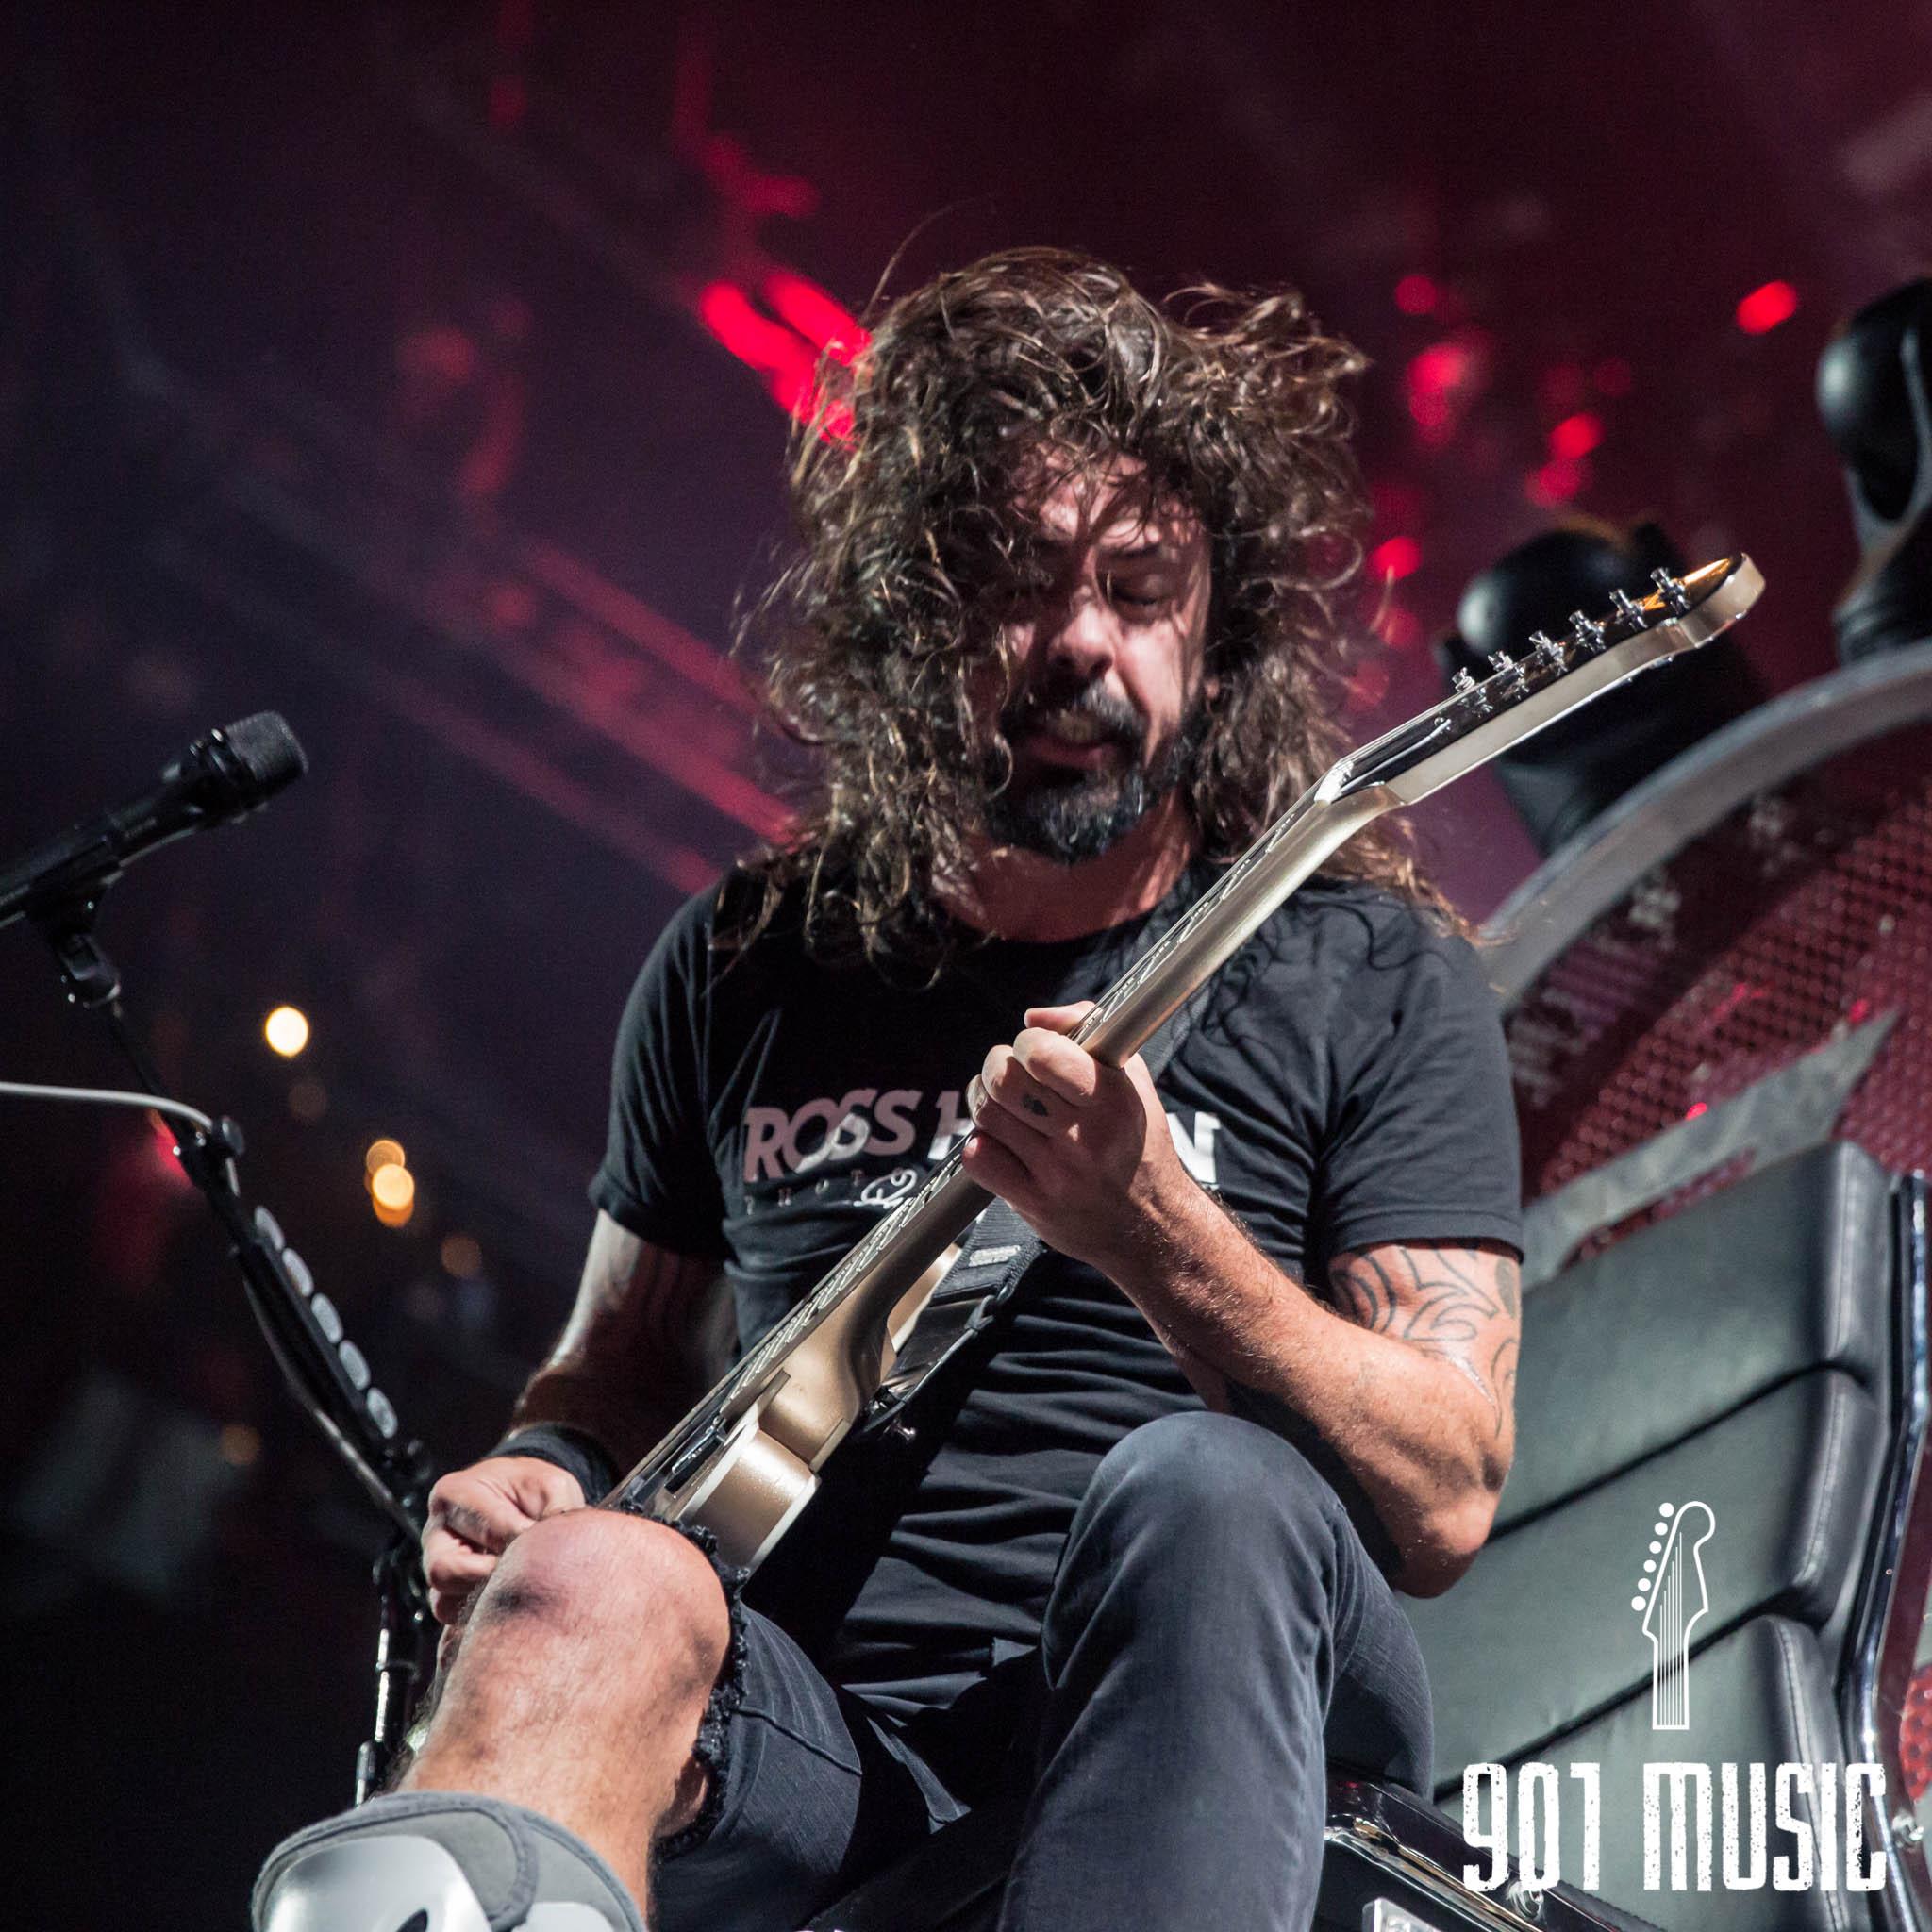 na-1007-Foo Fighters-23.jpg